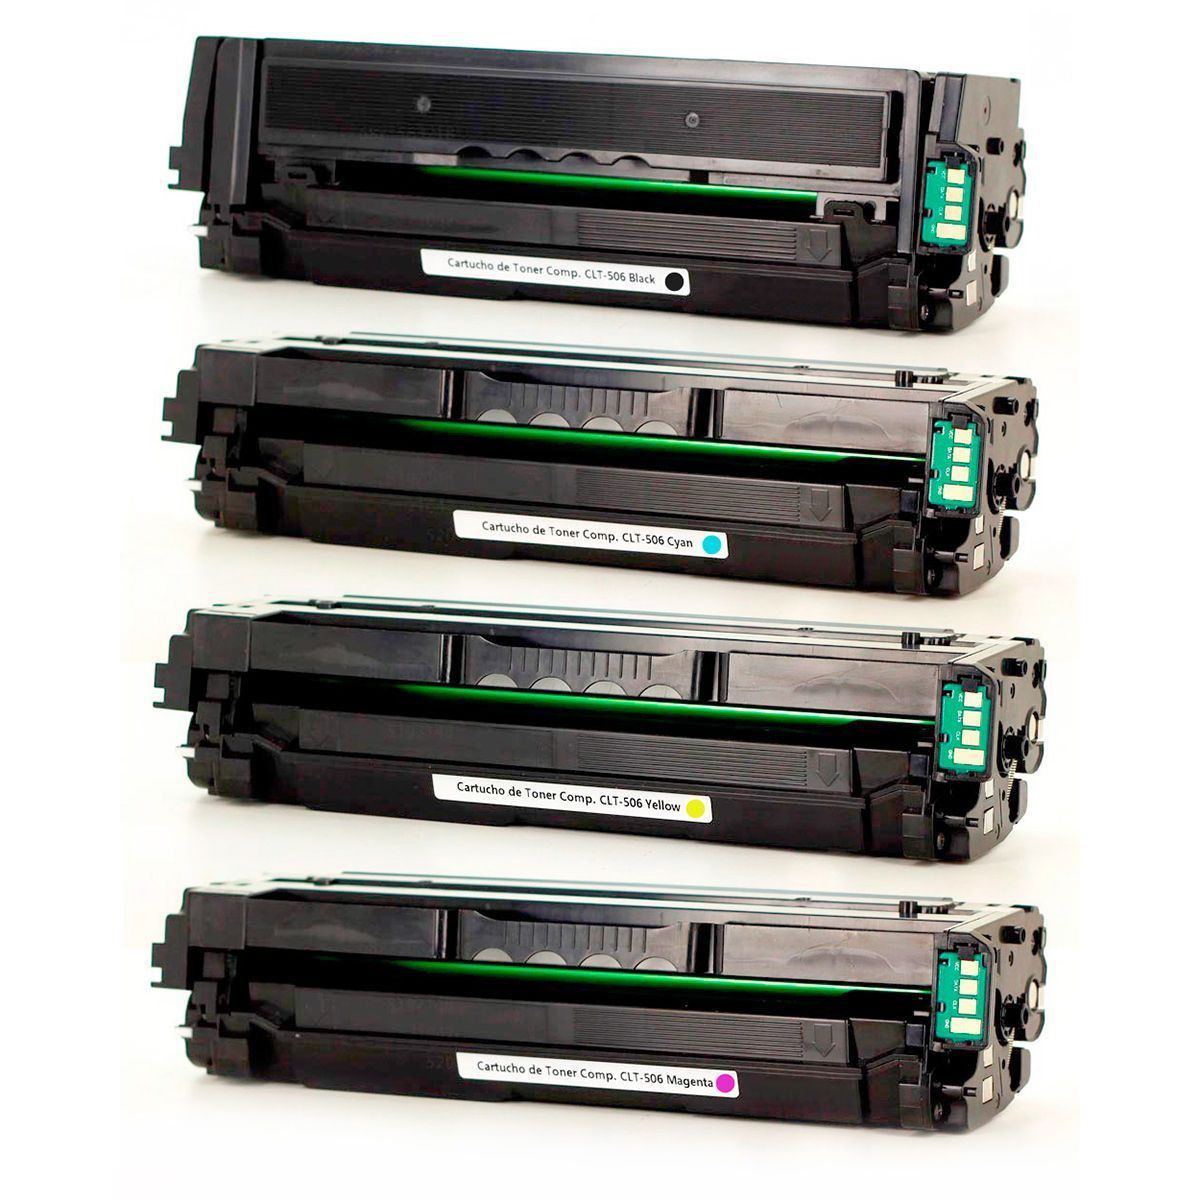 Compatível: Kit Colorido de Toner CLT506 506L para Samsung CLP-680 CLX-6260 CLP-680nd CLX-6260fr CLP680 CLX6260 CLP680nd